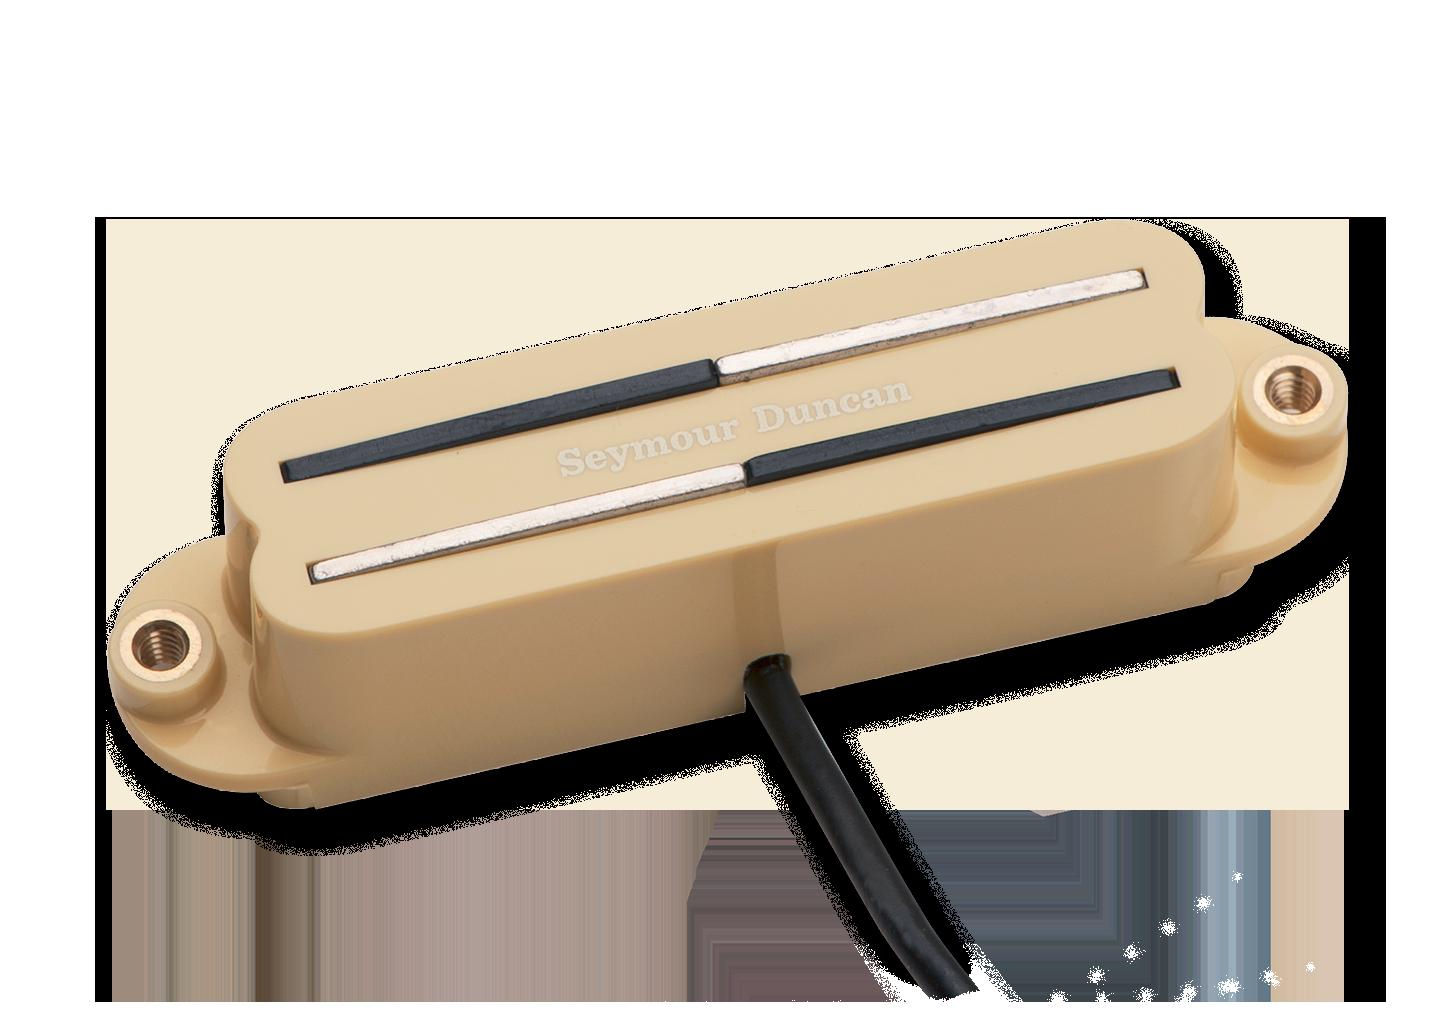 Seymour Duncan Vintage Rails Strat SVR-1N Neck Cream